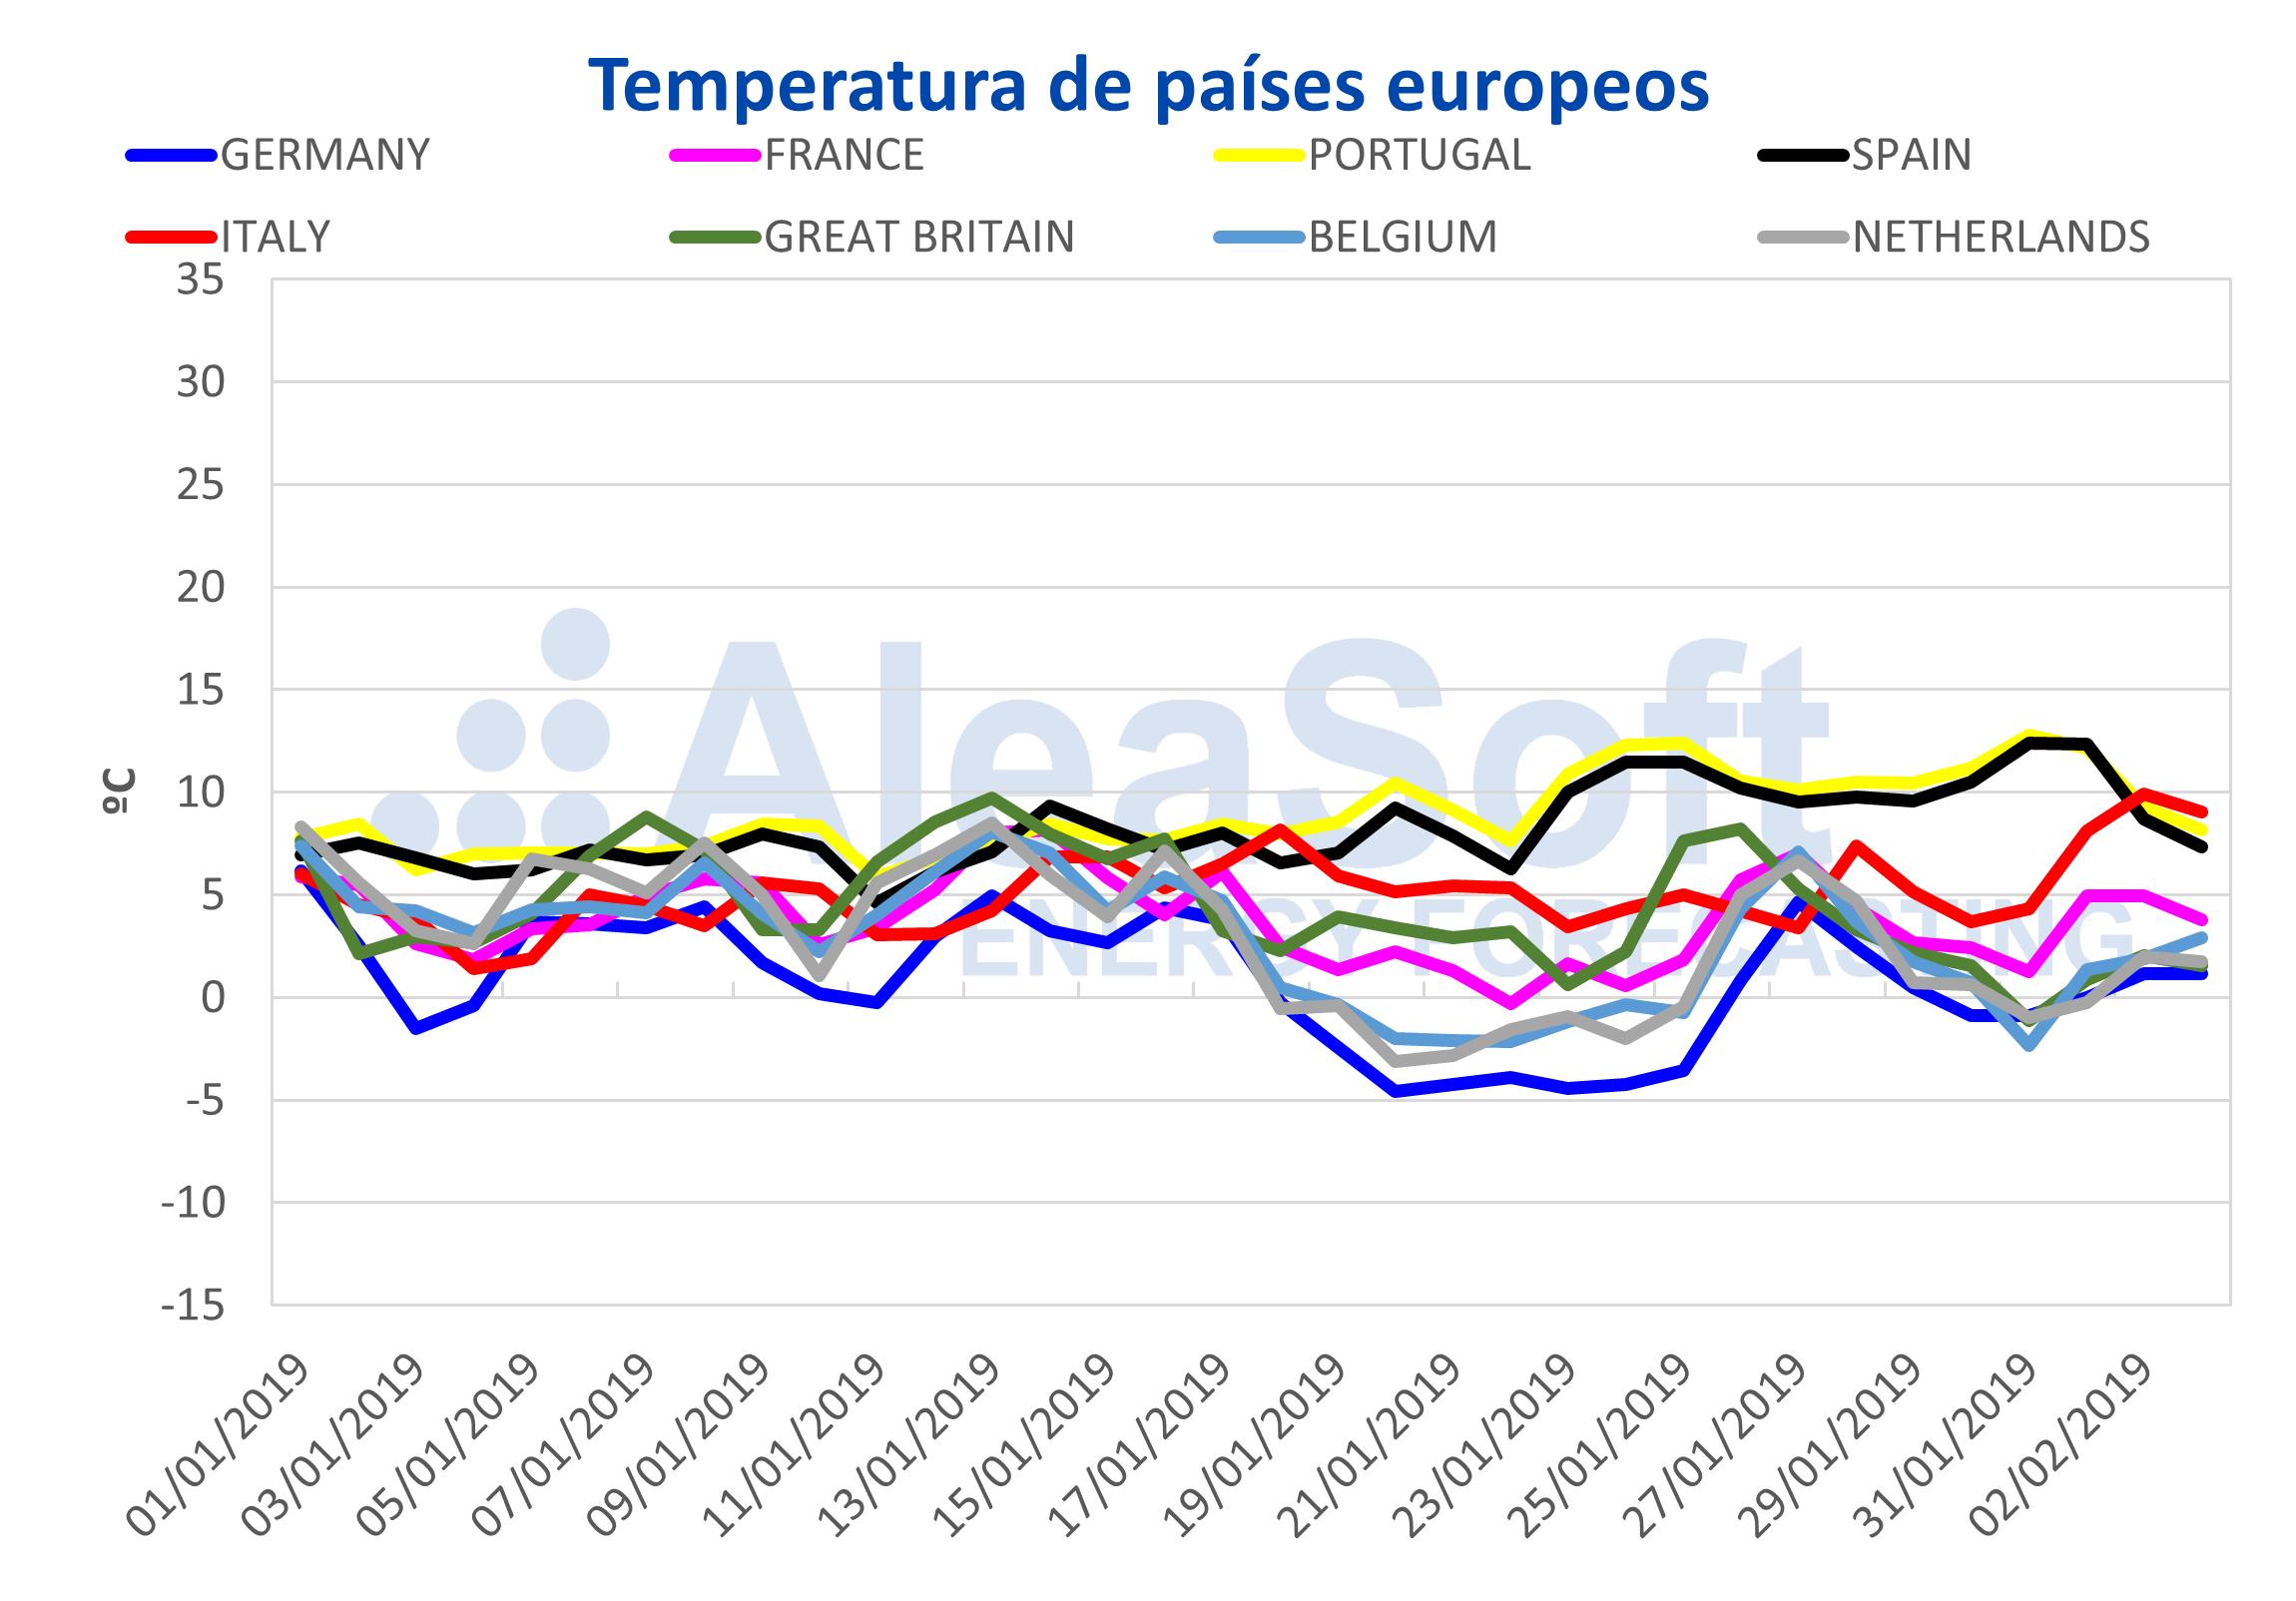 AleaSoft - Temperatura de paises europeos